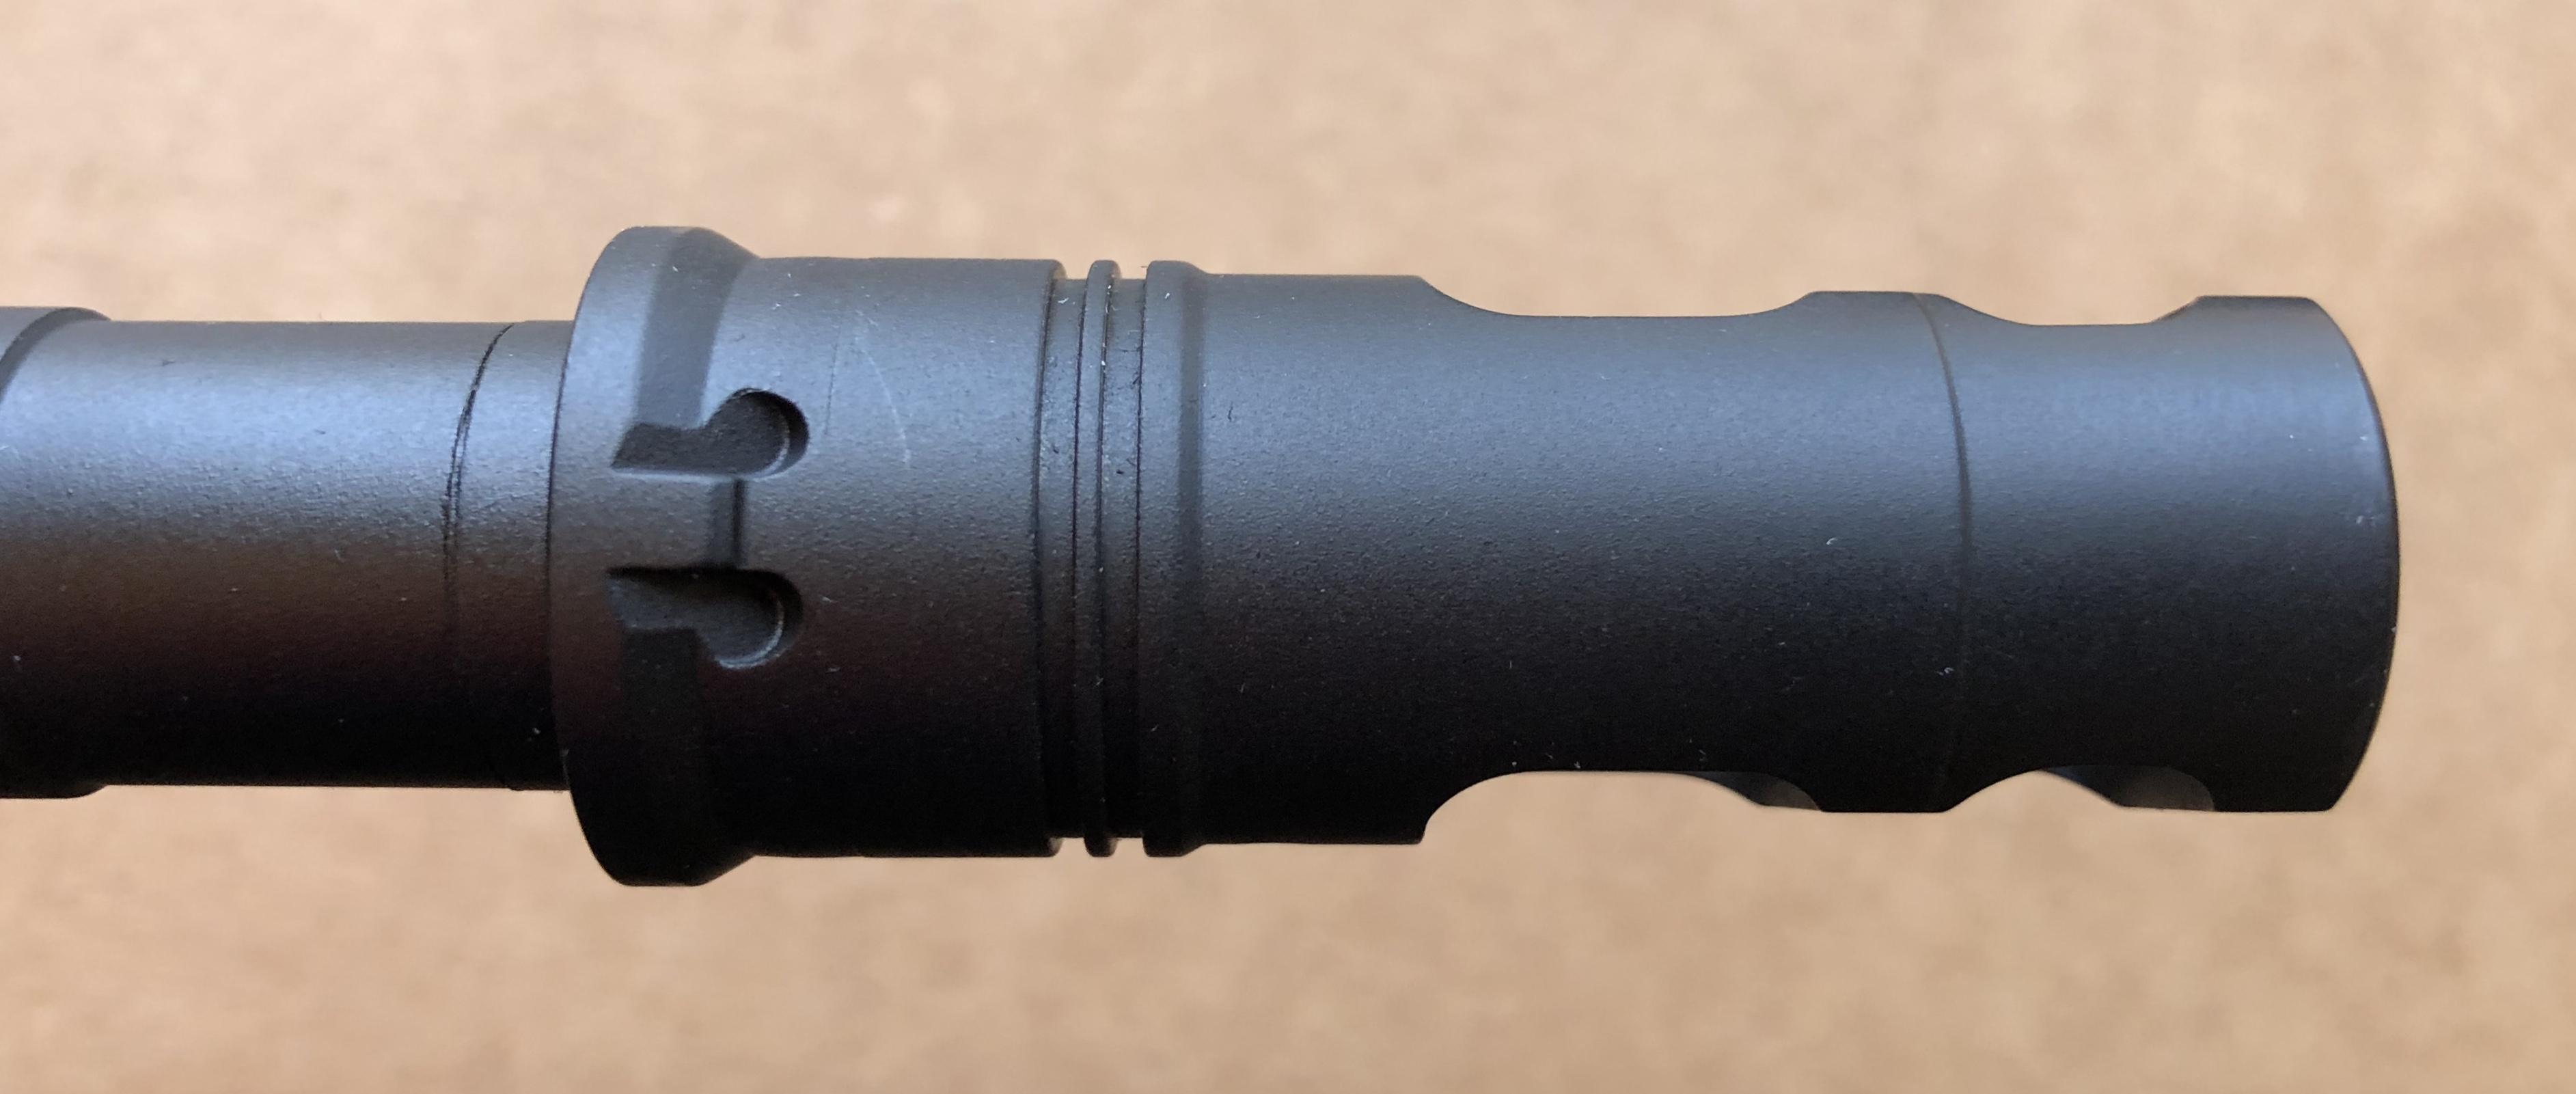 Colt 14 5 SOCOM Upper Pinned SF MB